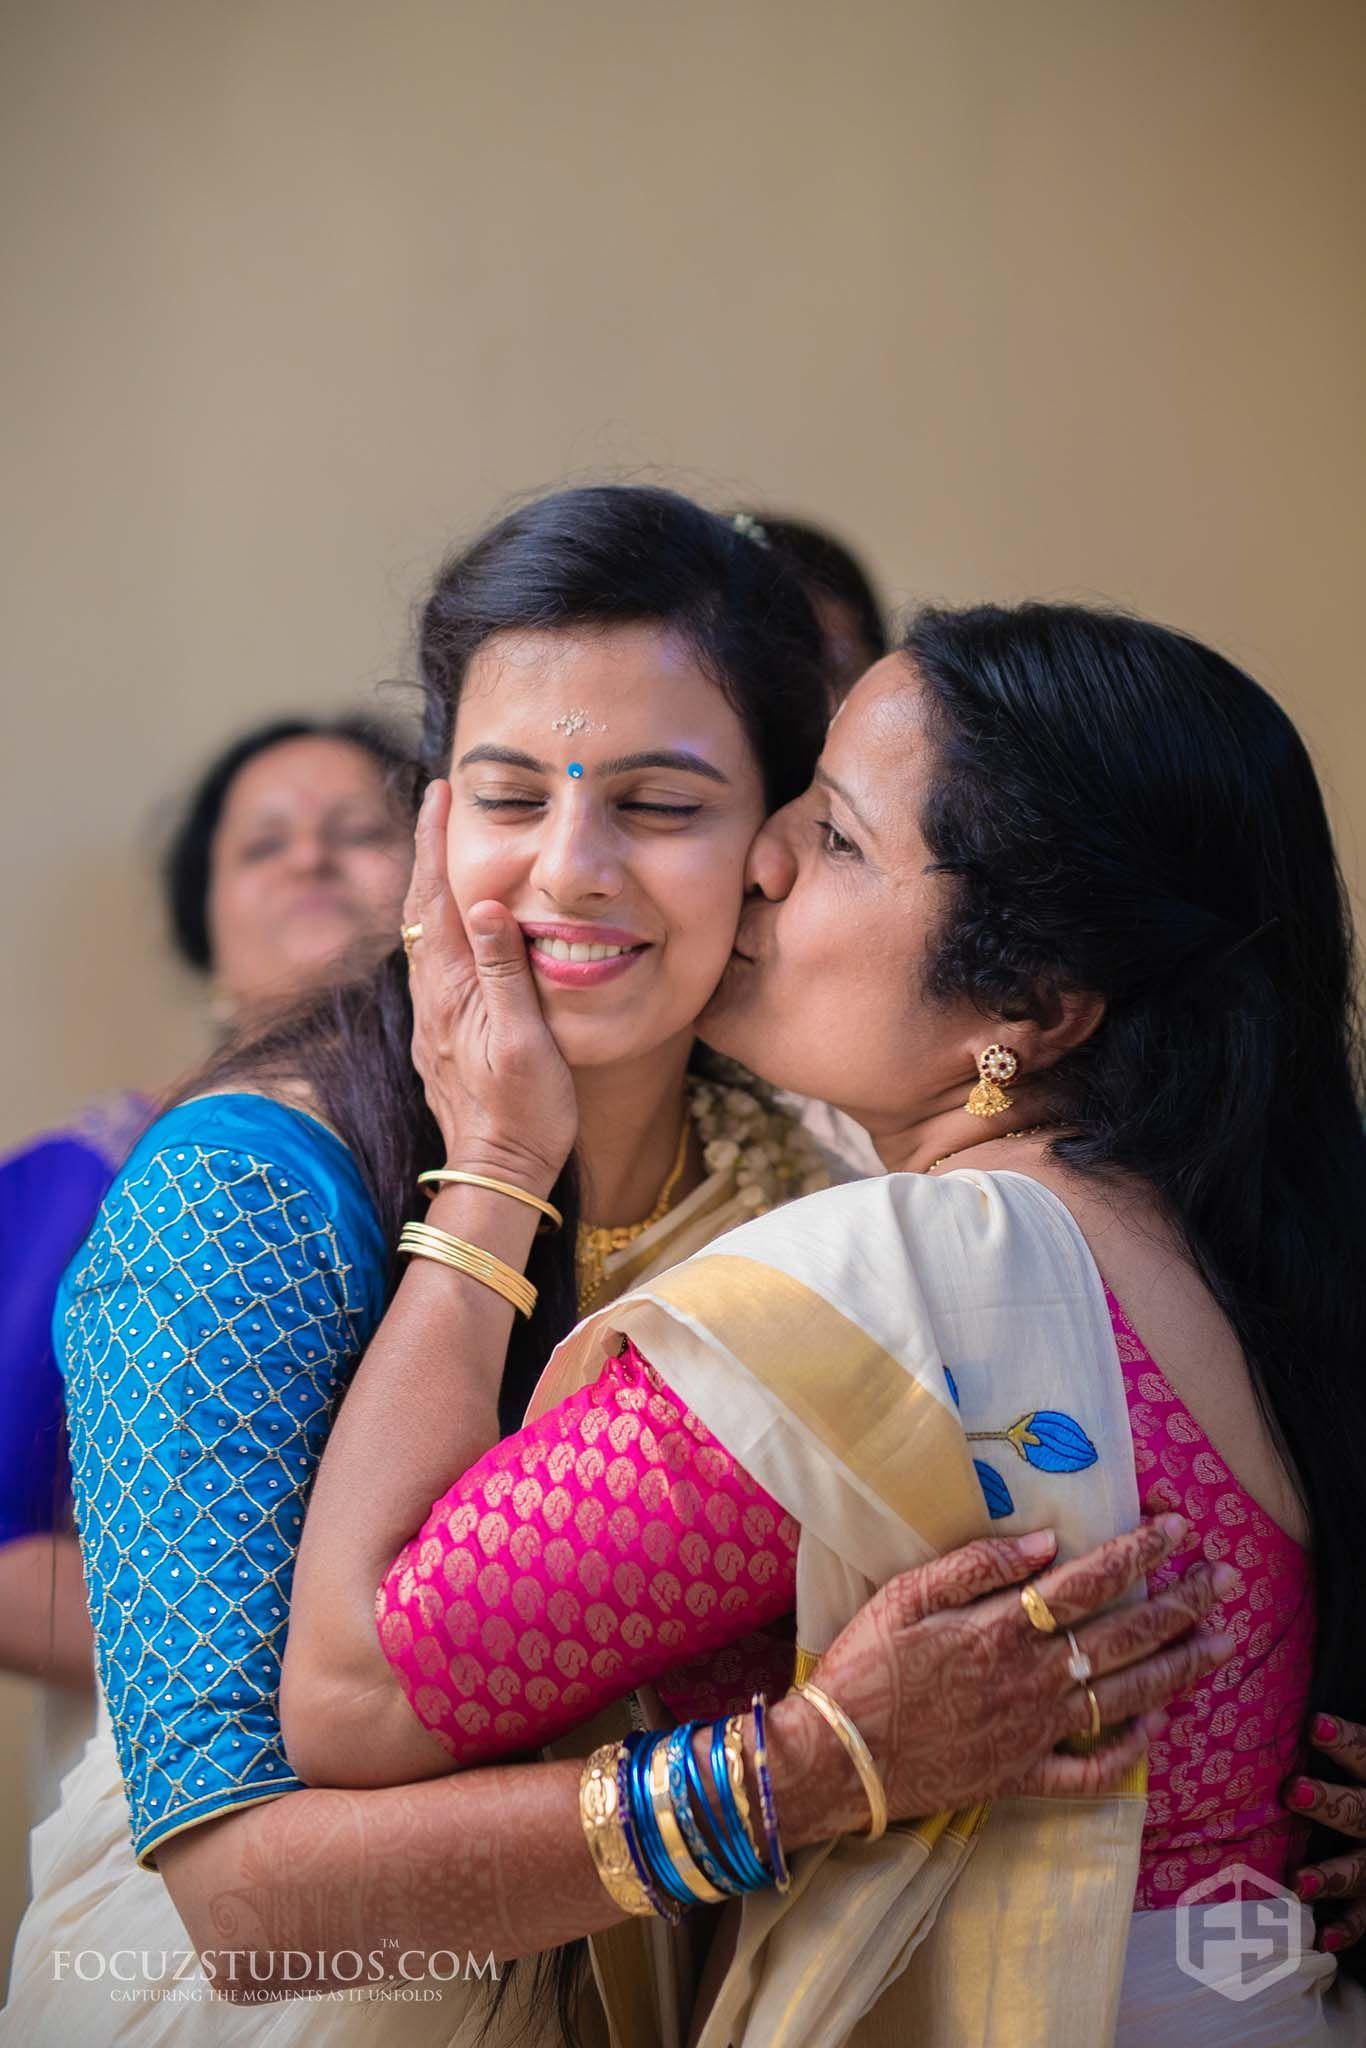 Kerala falling in love with tamilnadu kerala candid and wedding